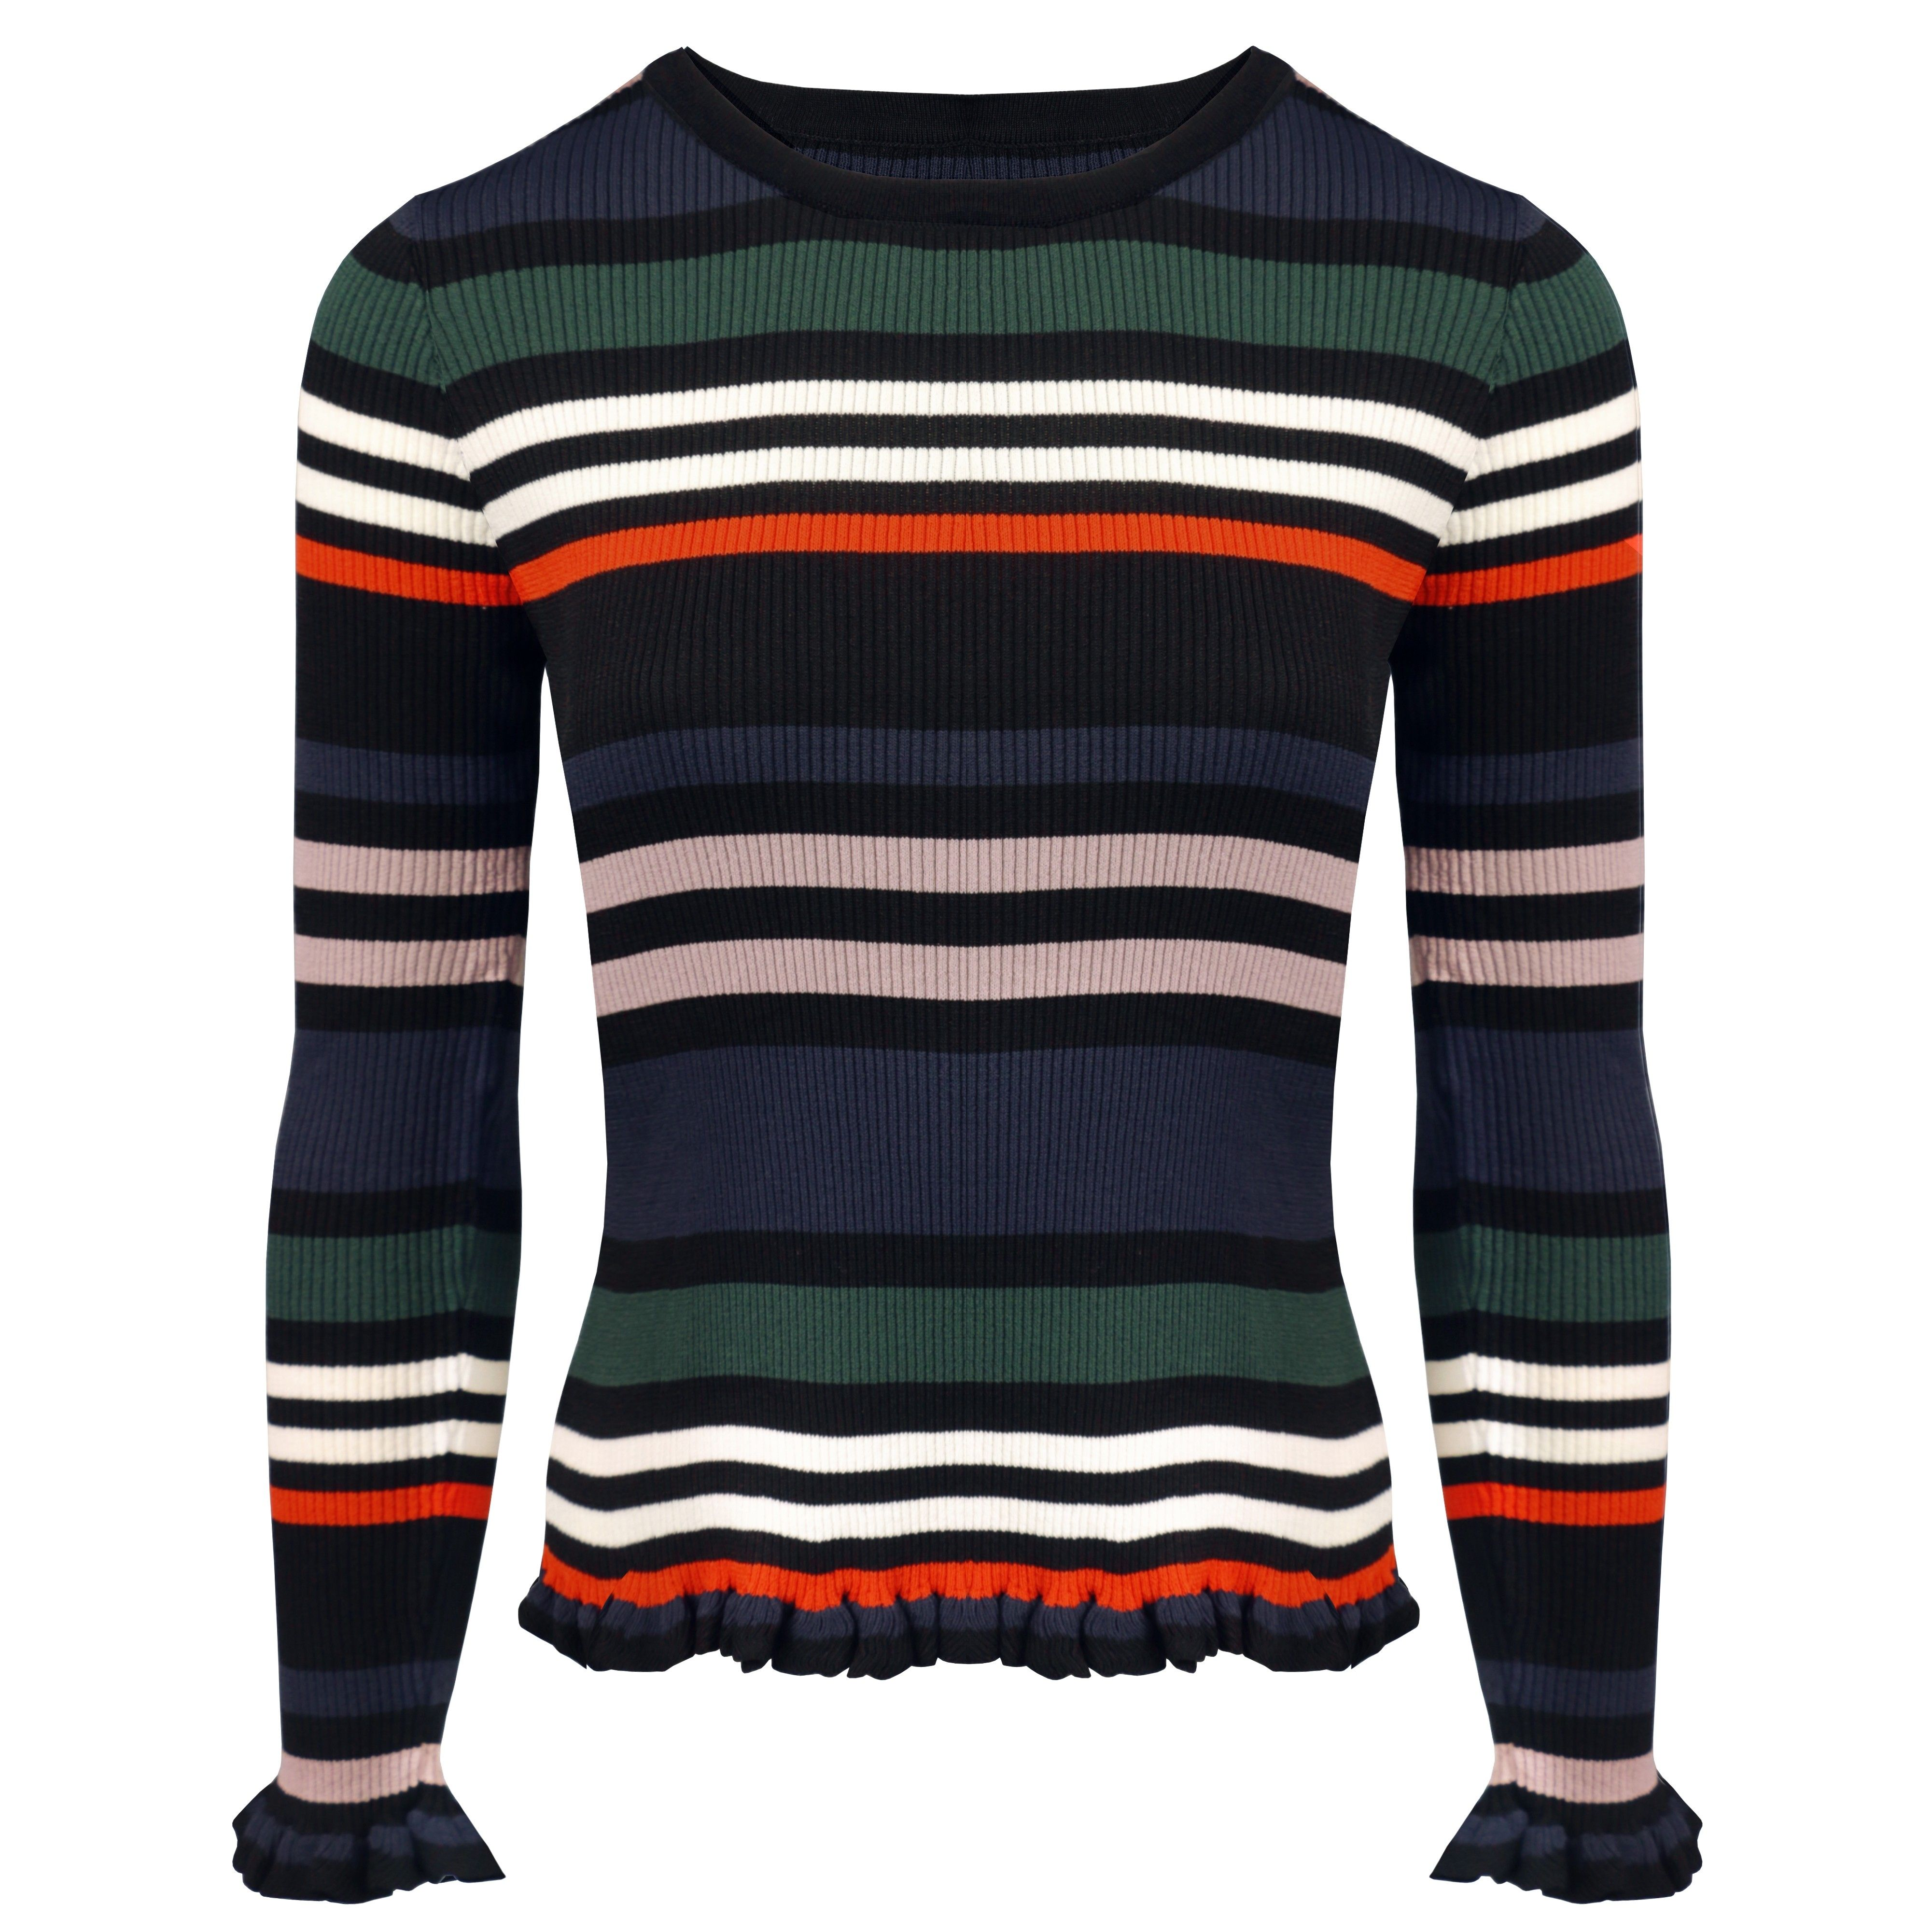 072f66c4f5d9ed Striped Longsleeve - Multicolor